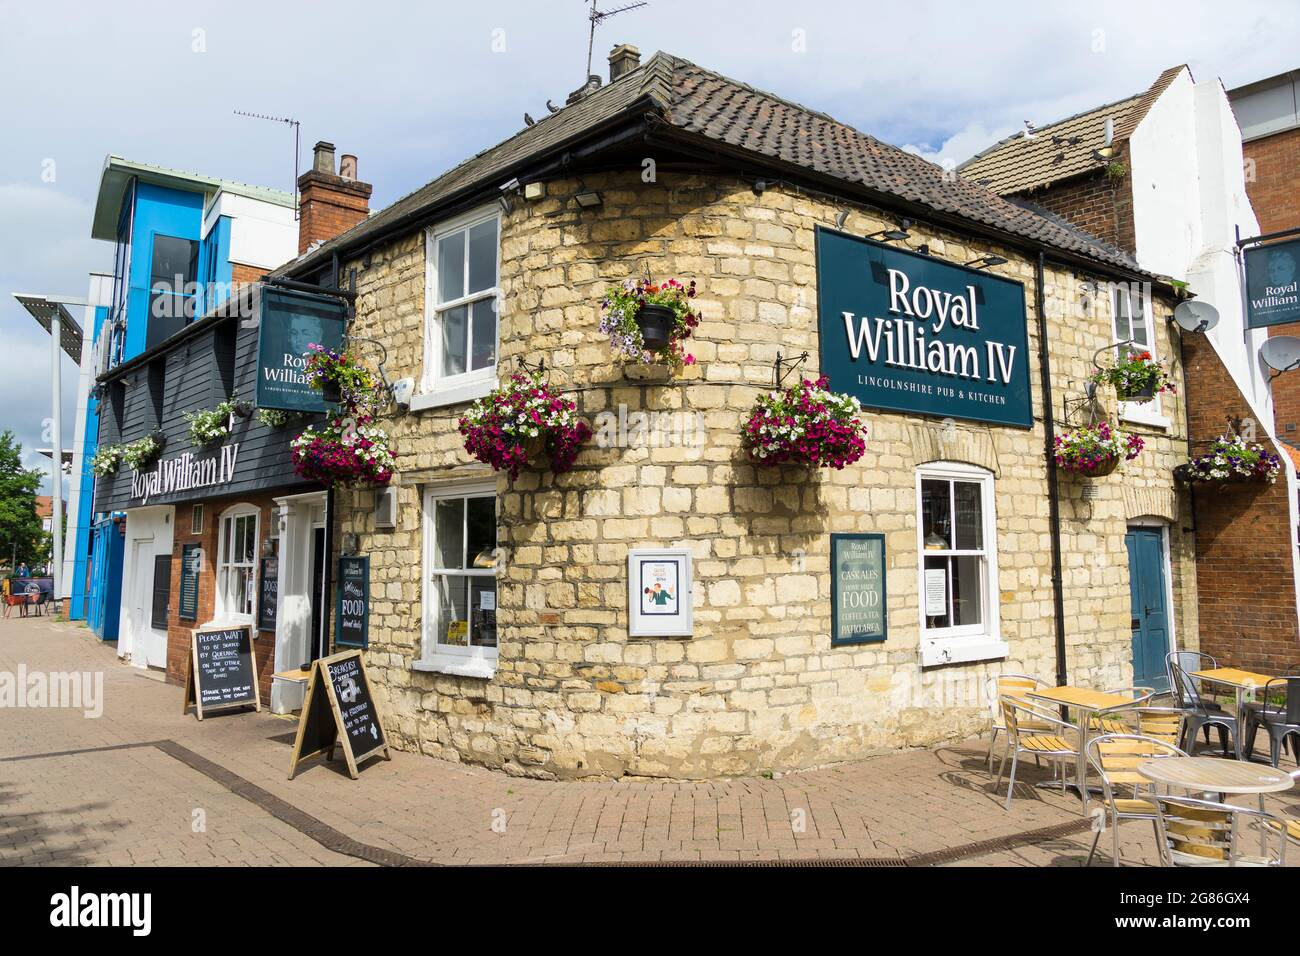 royal-william-iv-lincolnshire-pub-and-kitchen-brayford-wharf-north-lincoln-city-lincolnshire-2021-2G86GX4.jpg